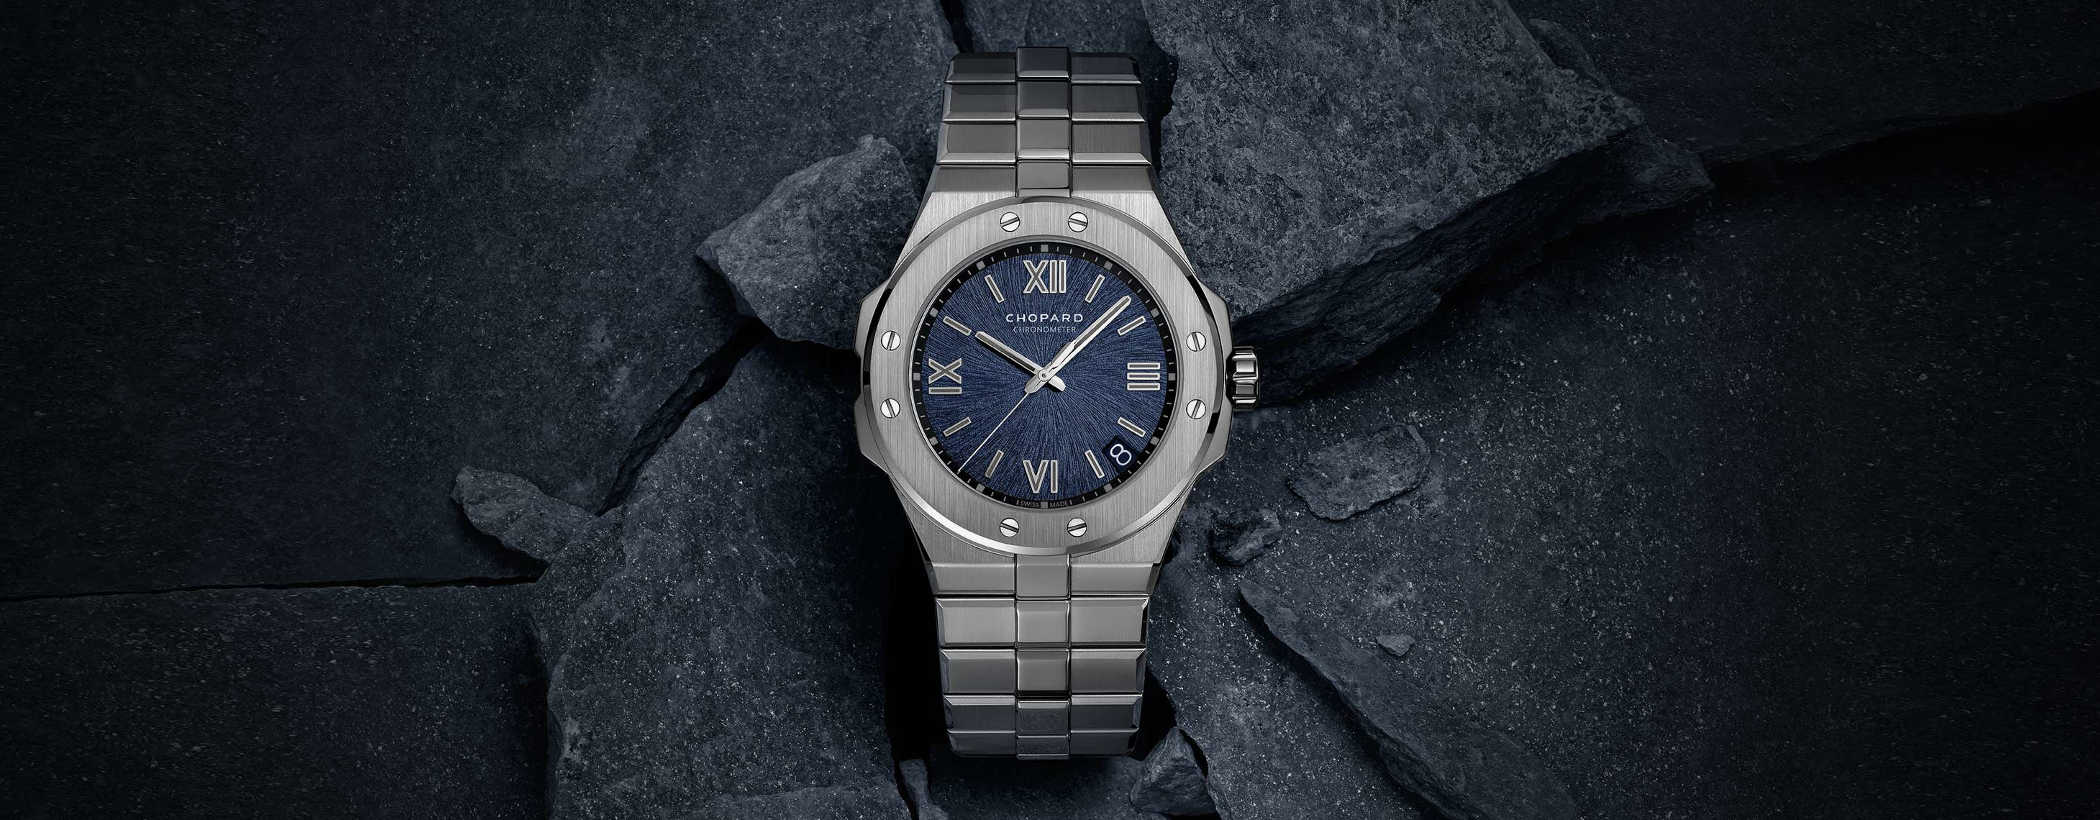 Chopard Alpine Eagle Uhren